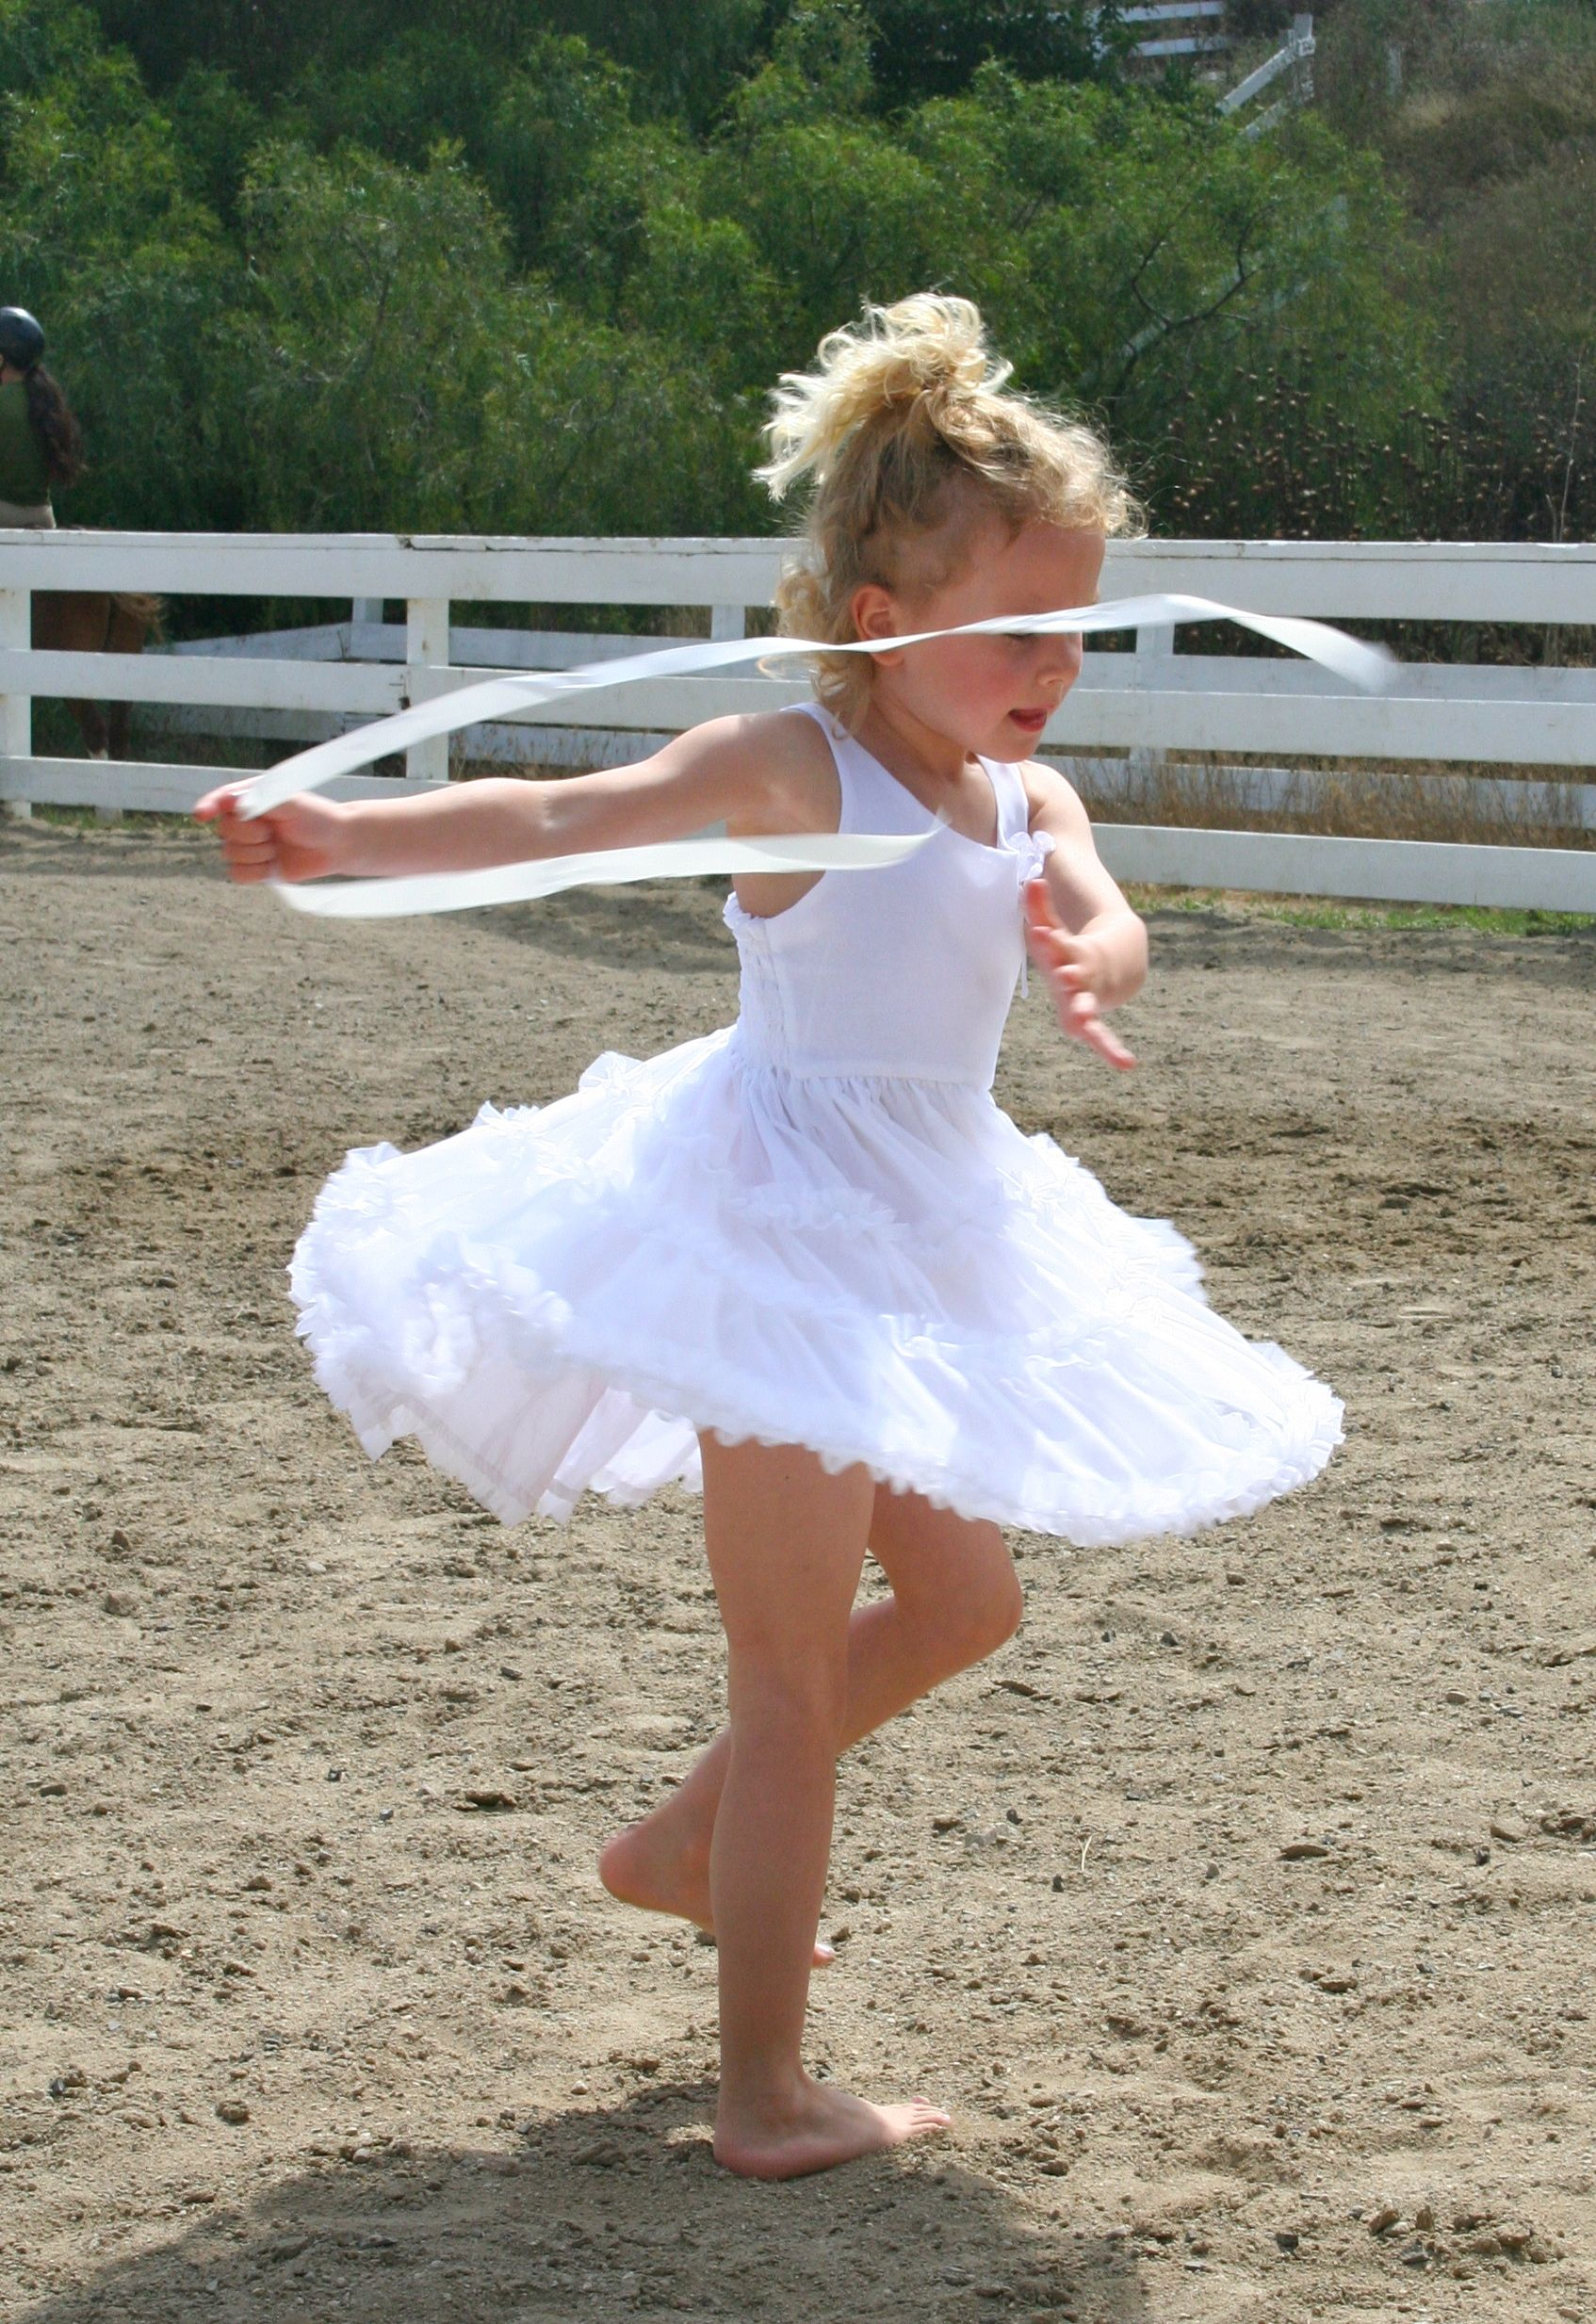 Twirling...what fun!